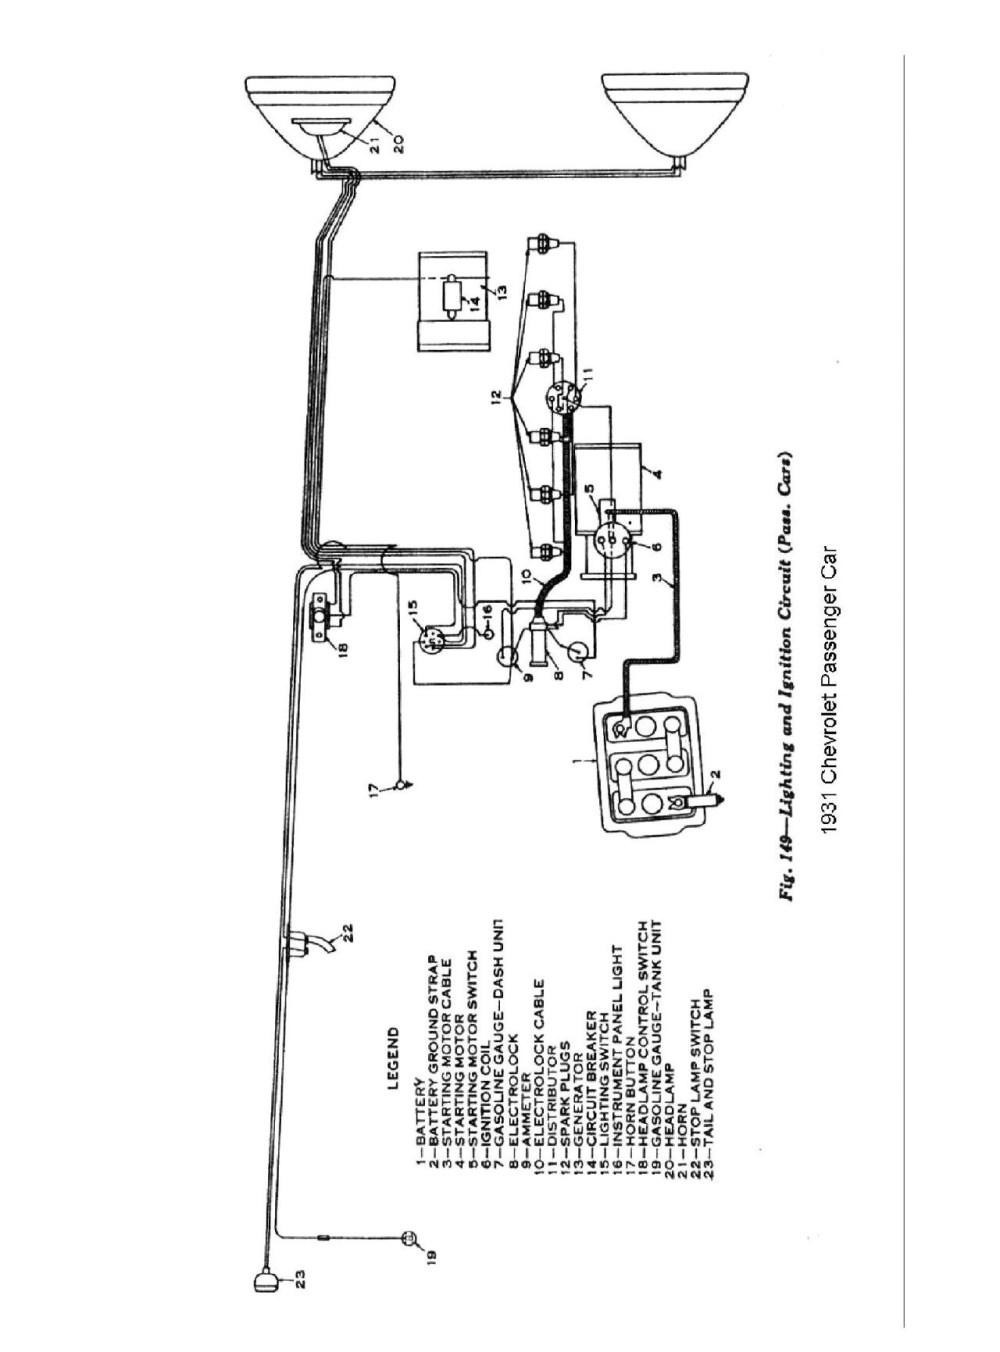 medium resolution of fresh air horn wiring diagram diagram